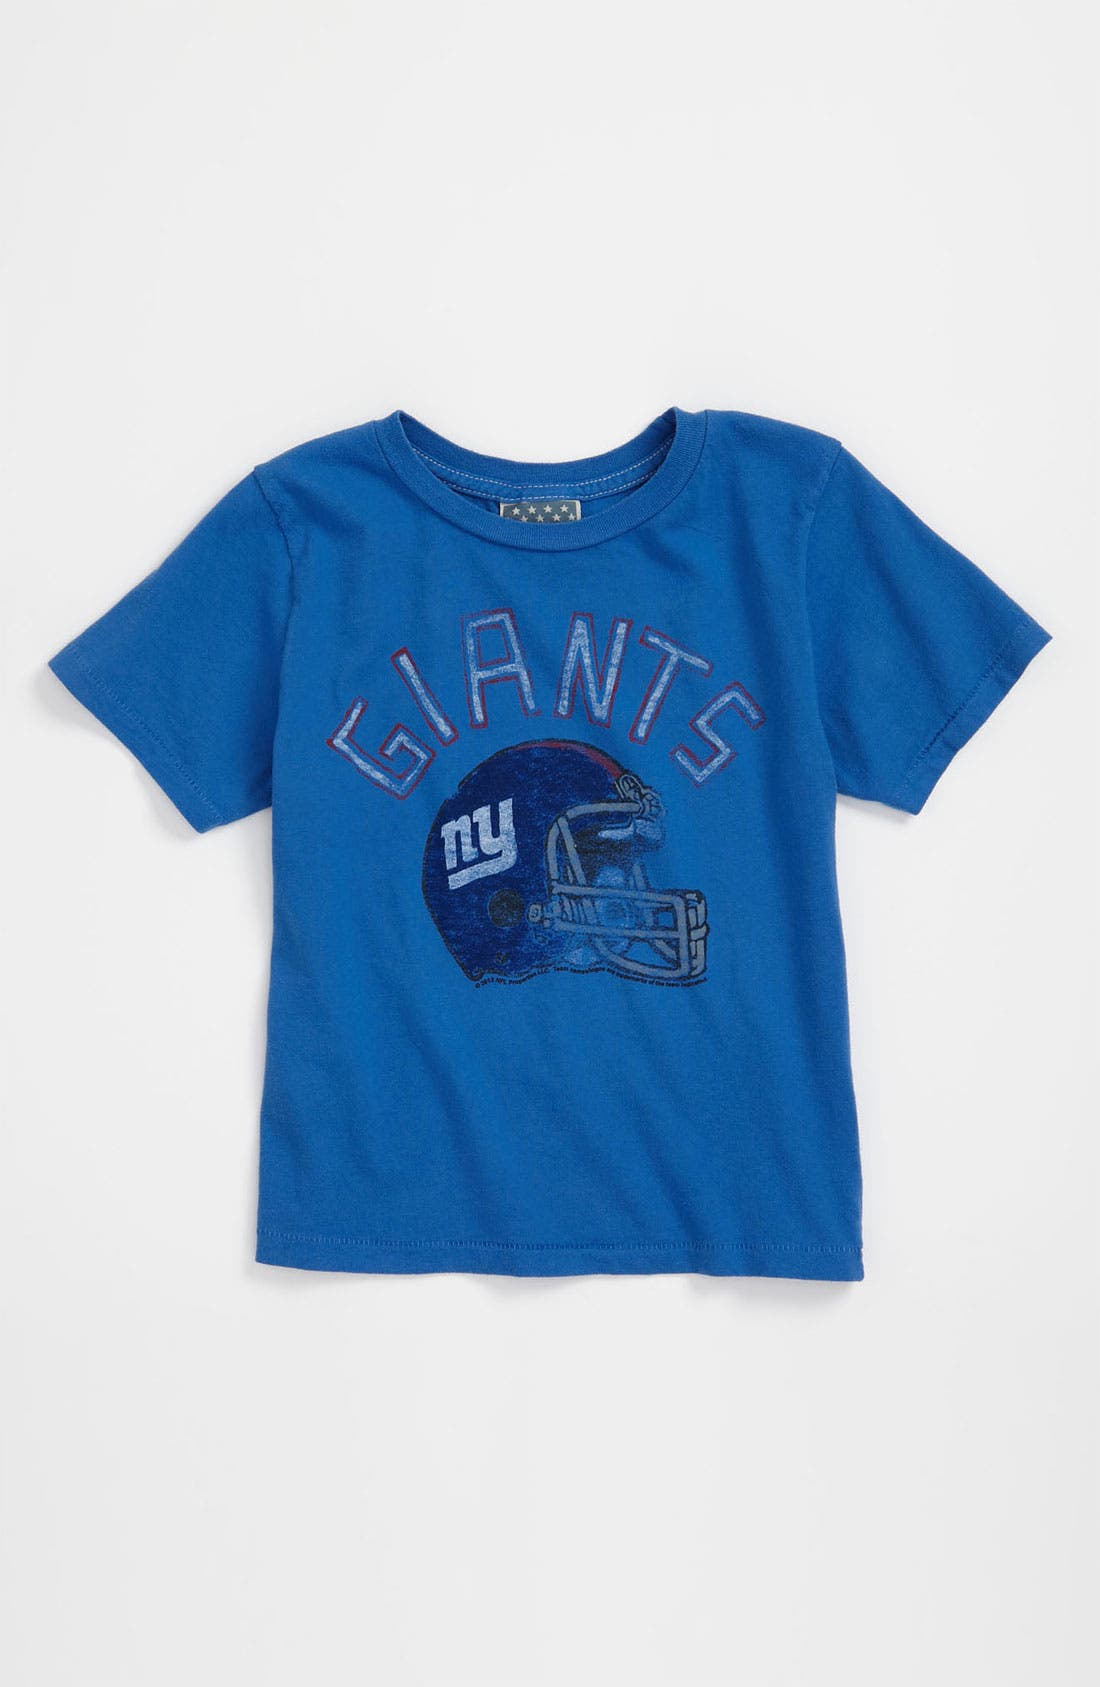 Alternate Image 1 Selected - Junk Food 'New York Giants' T-Shirt (Infant)